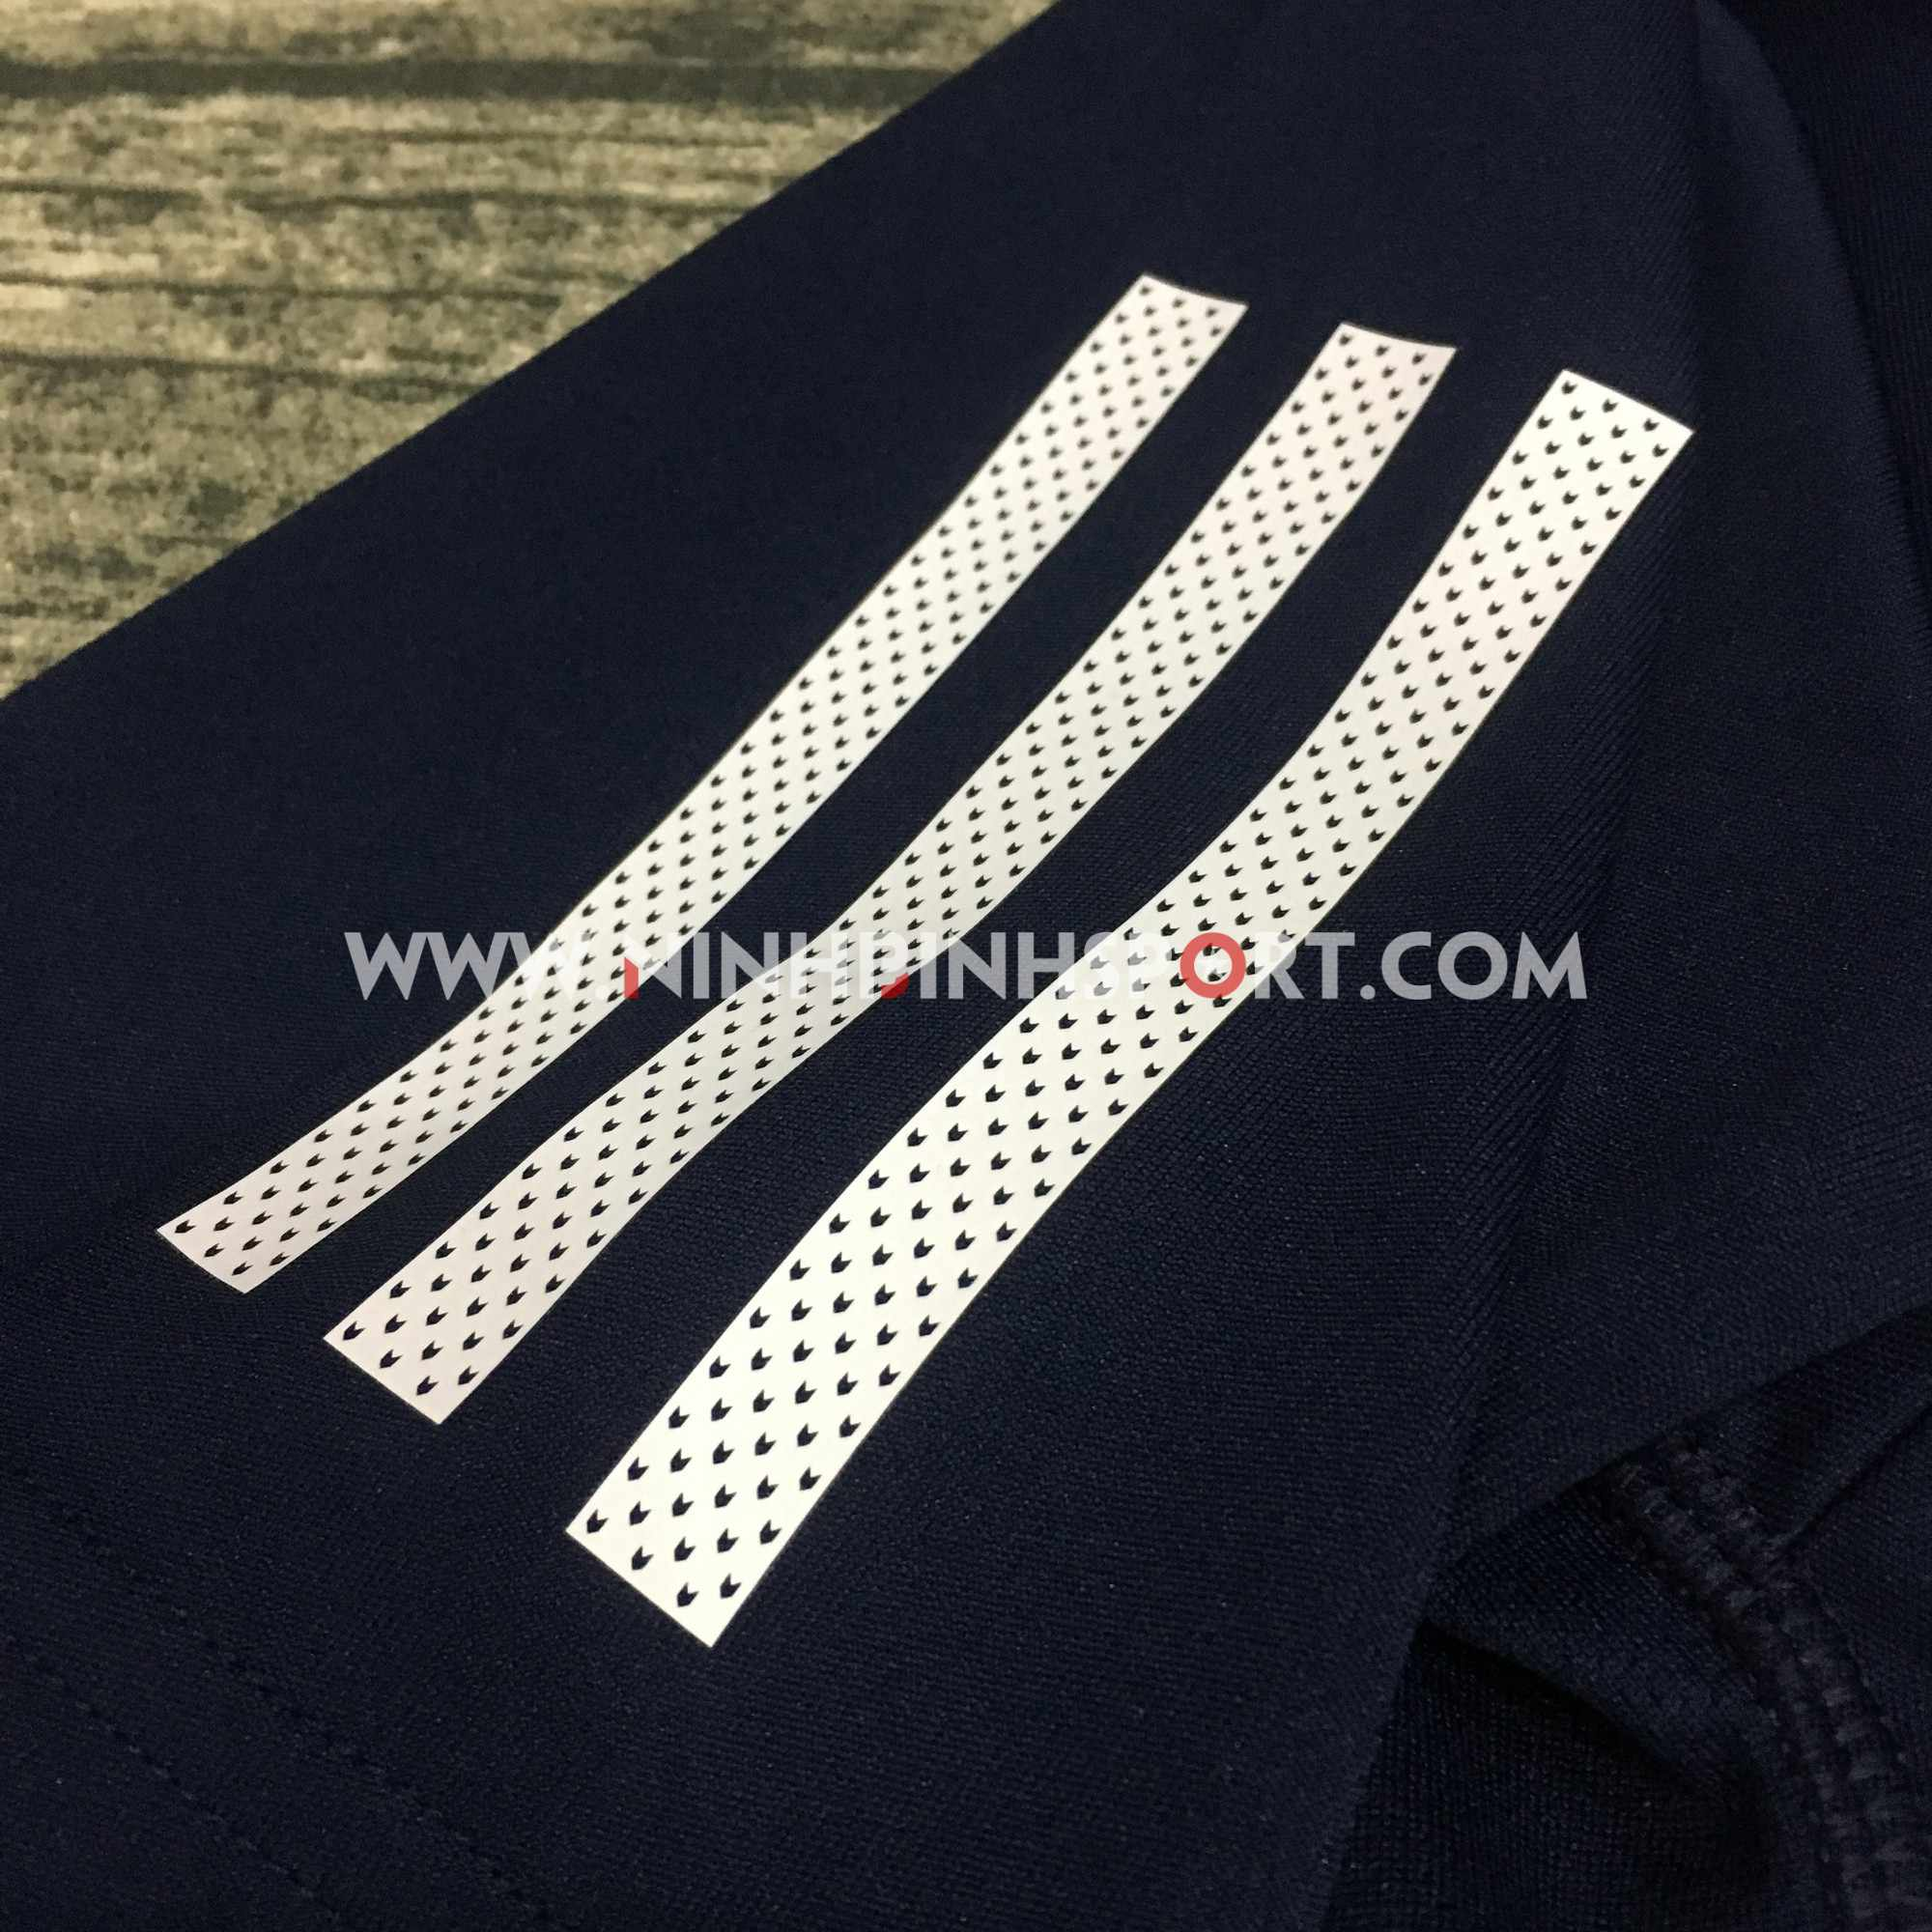 Áo thể thao nam Adidas Club 3 Stripes Tee Conavy DU0858